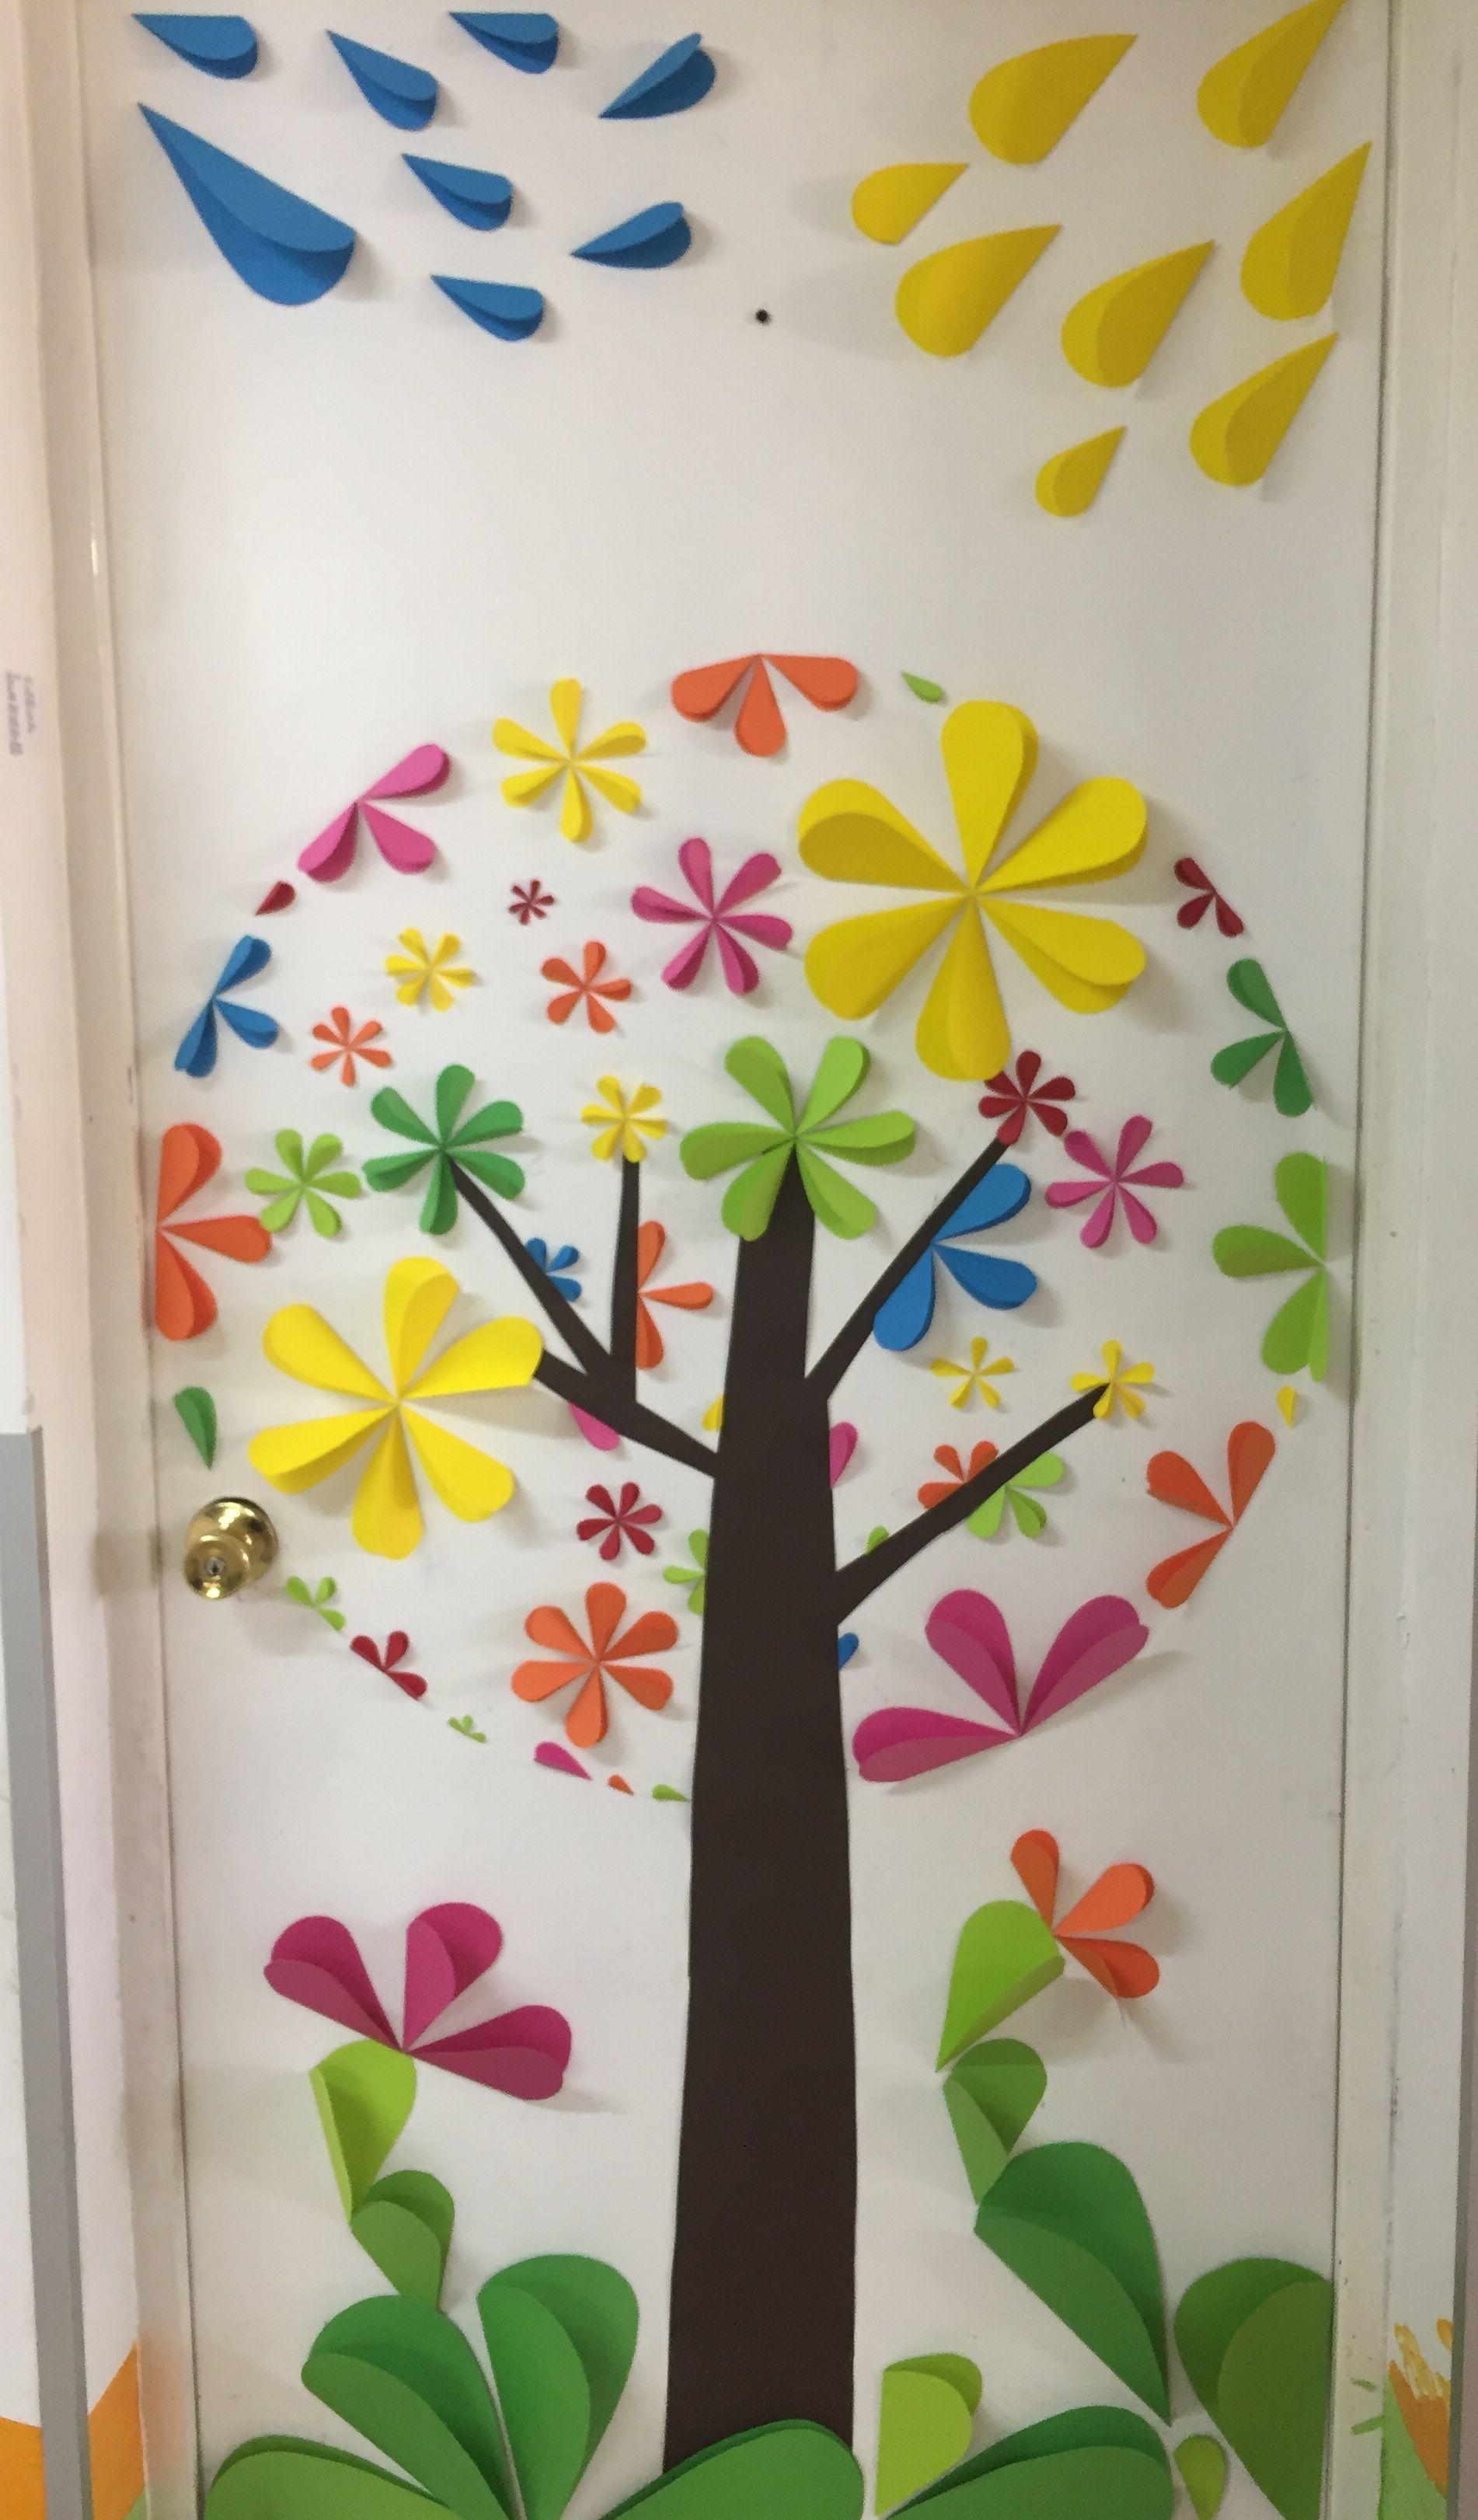 Decoraci n de puerta para primavera ni os school for Decoracion puerta aula infantil